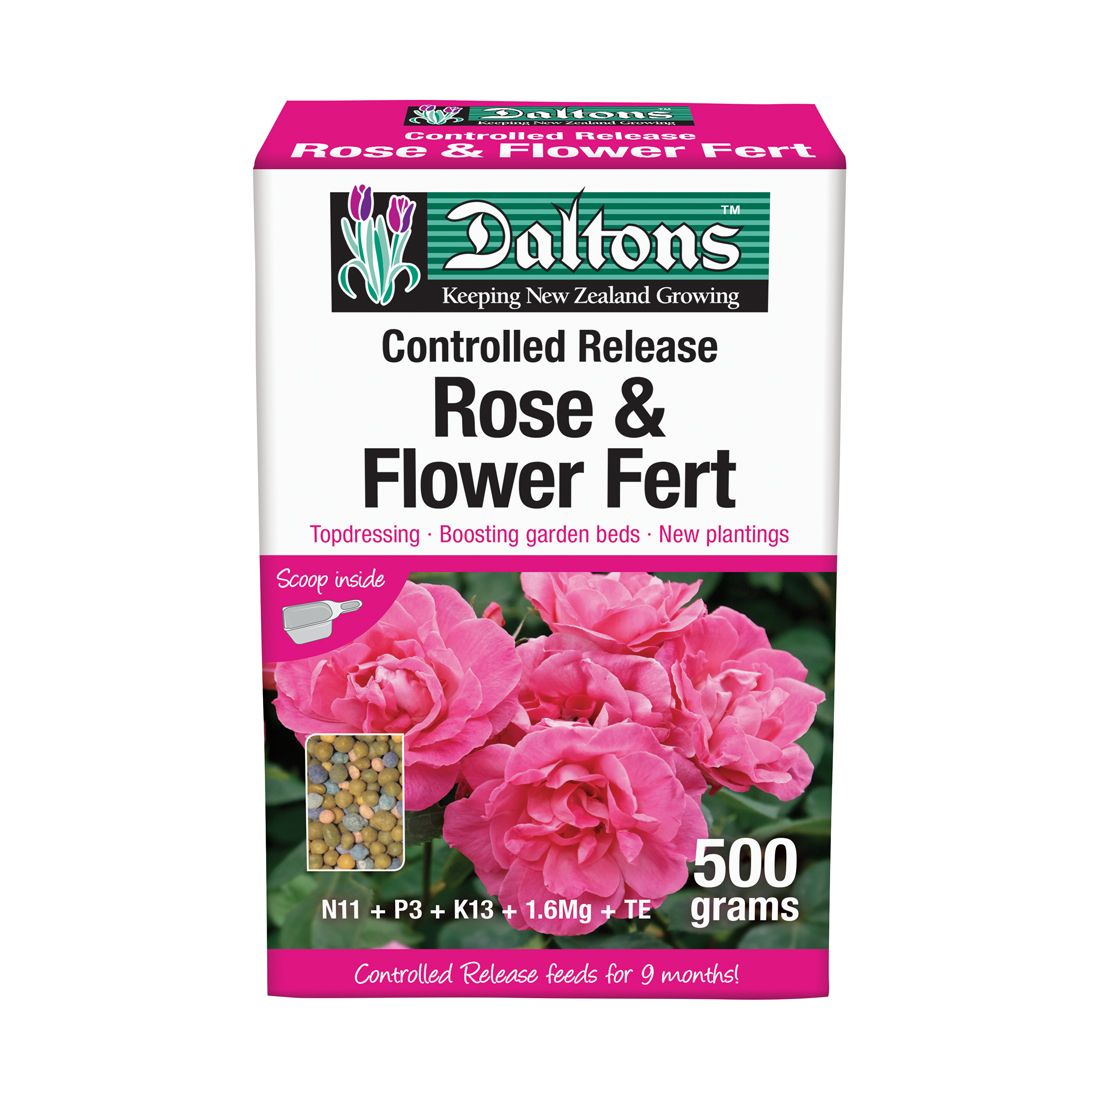 Rose & Flower Fertilizer Controlled Release 500g Box